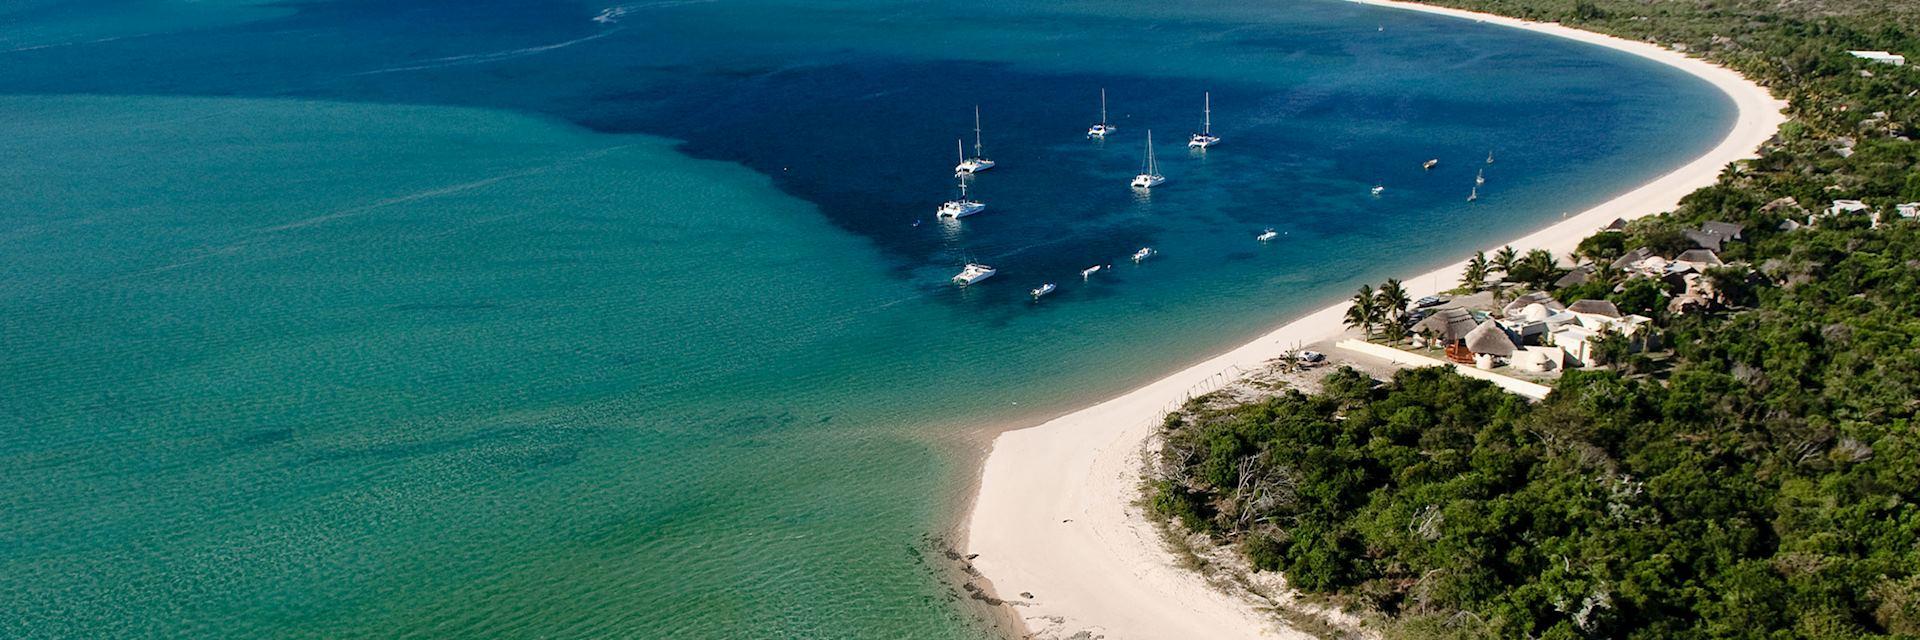 Benguerra Lodge, Bazaruto Archipelago, Mozambique